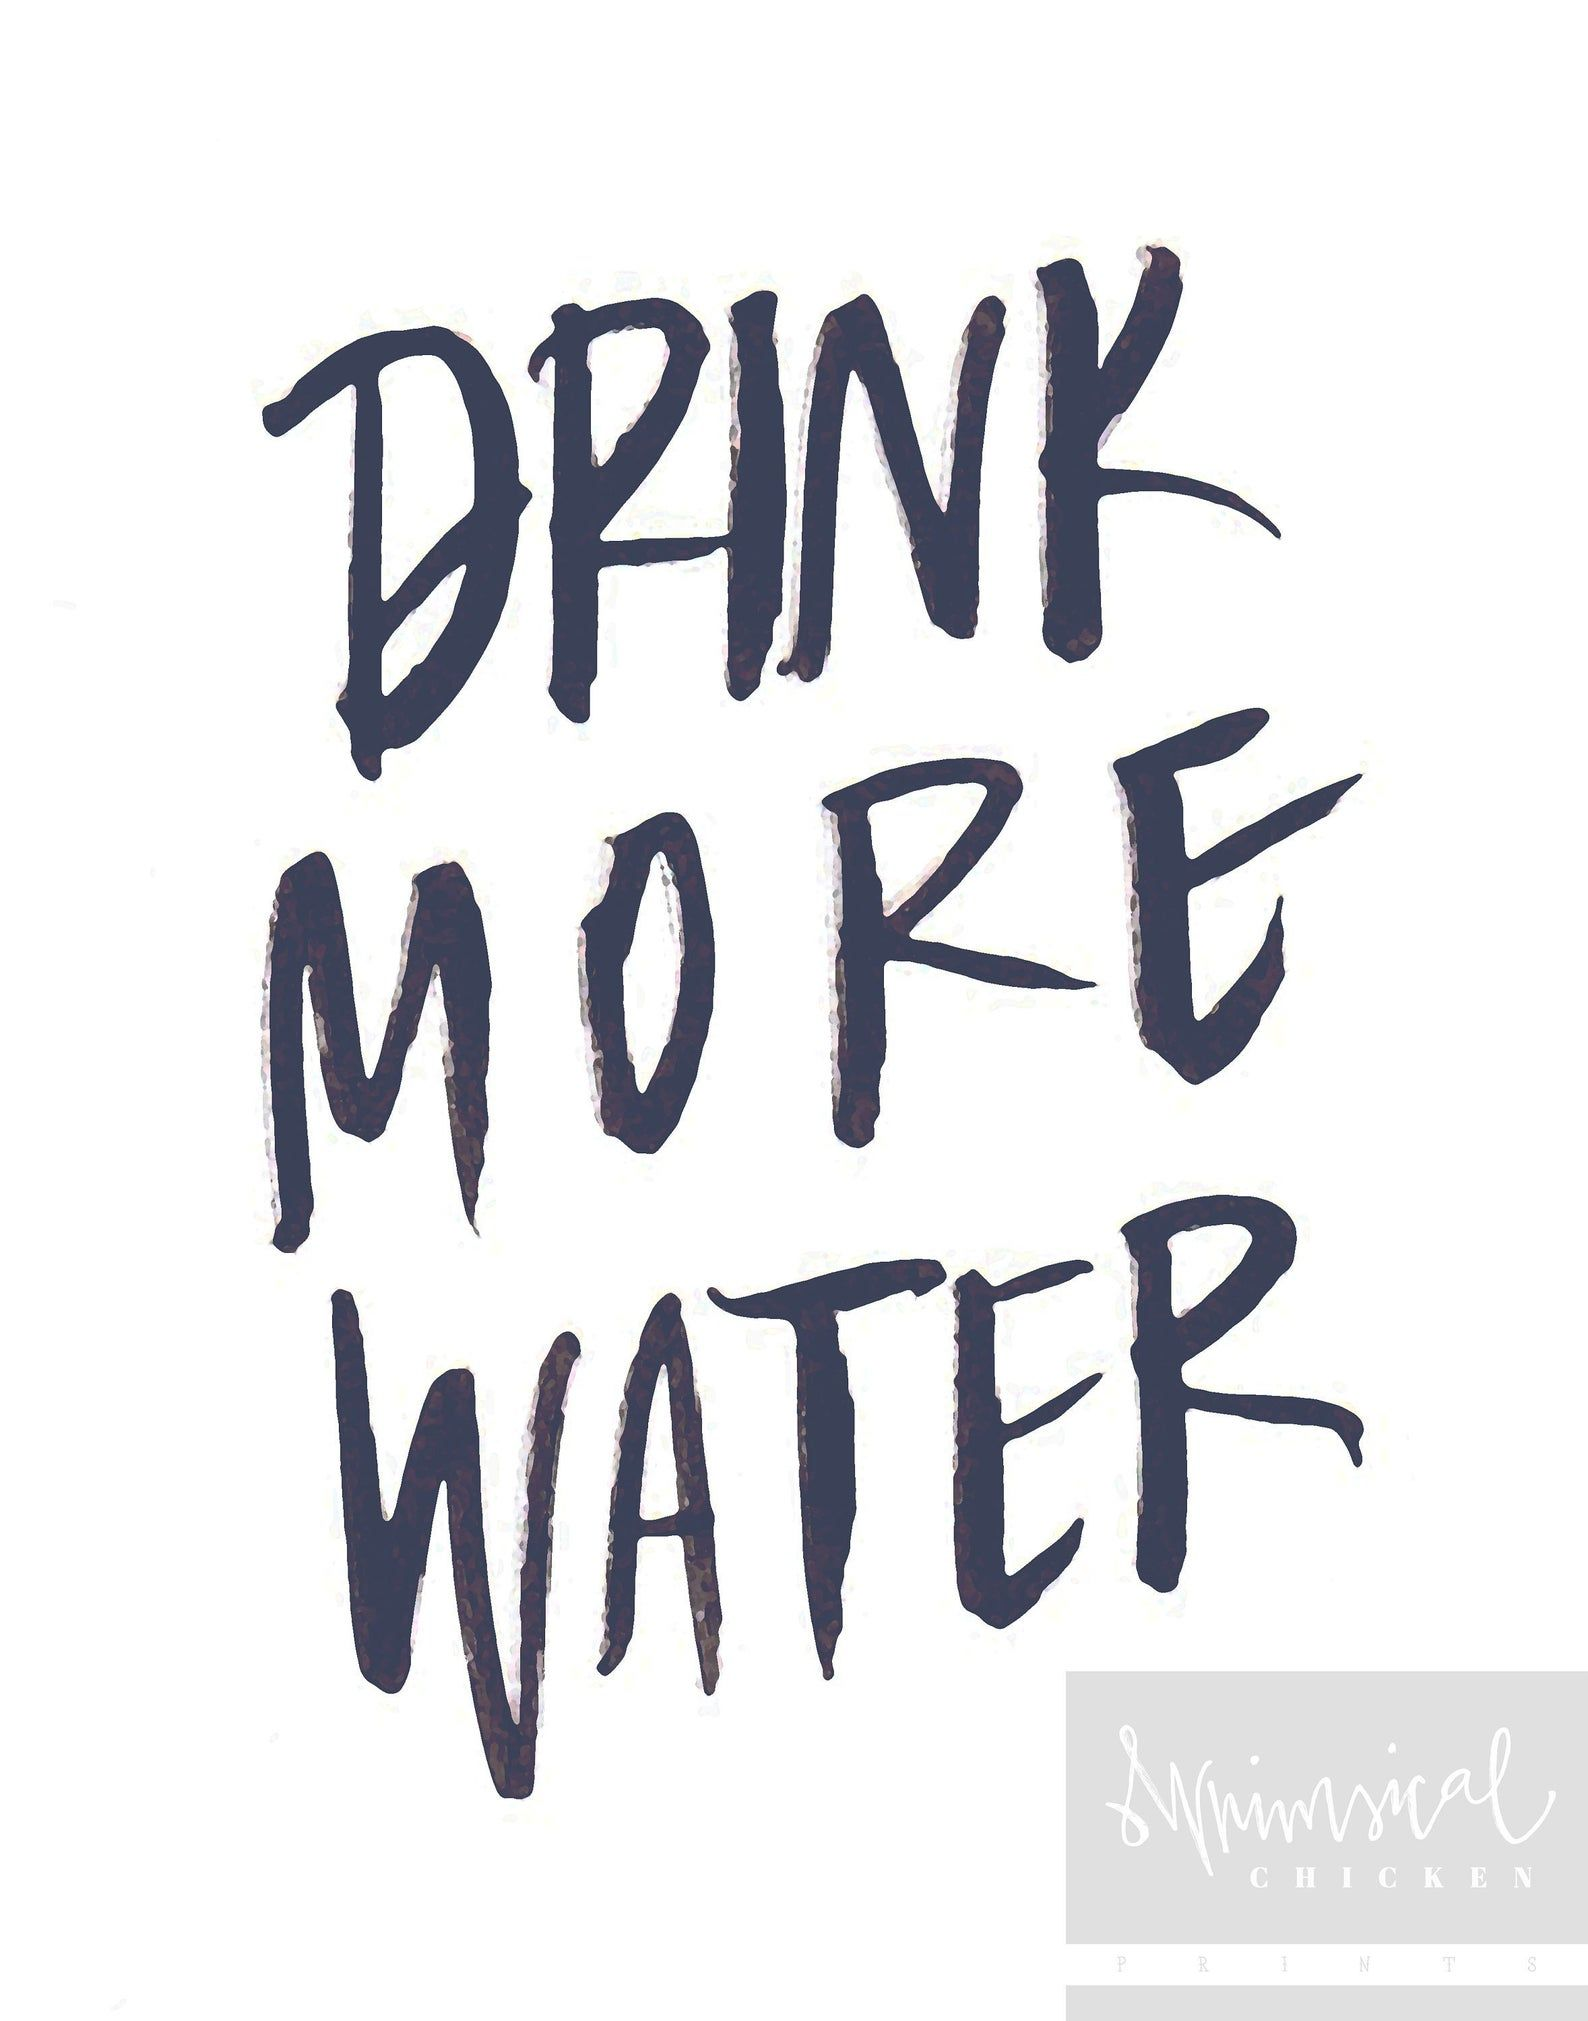 Drink More Water - Printable Wall Decor - Self-car